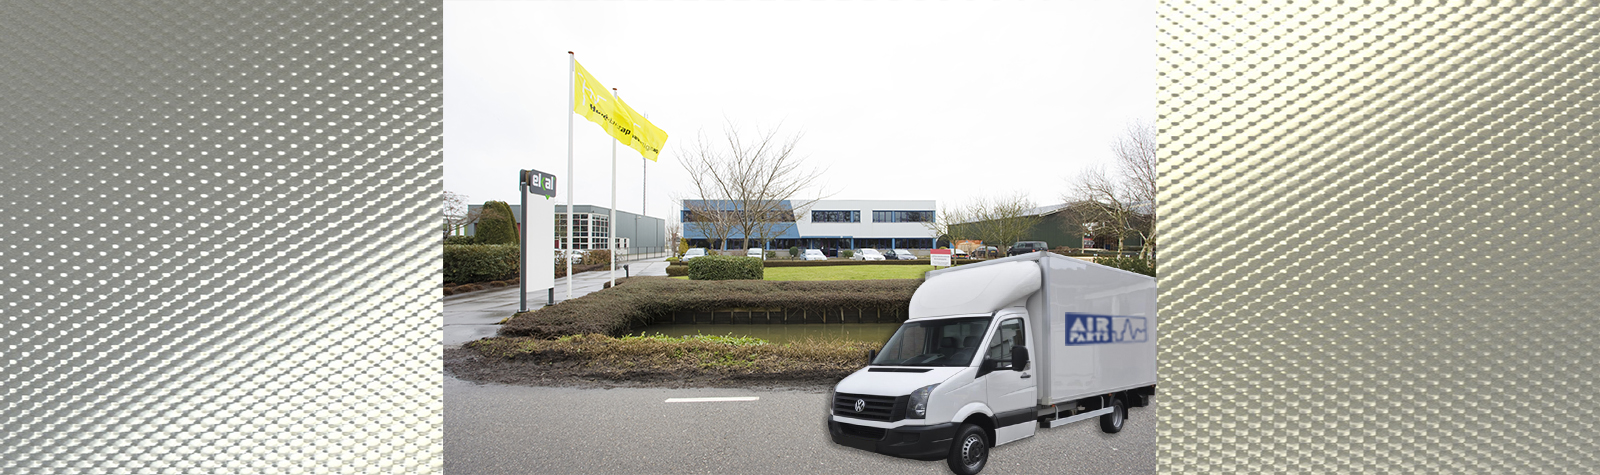 Air-Parts BV gaat verhuizen